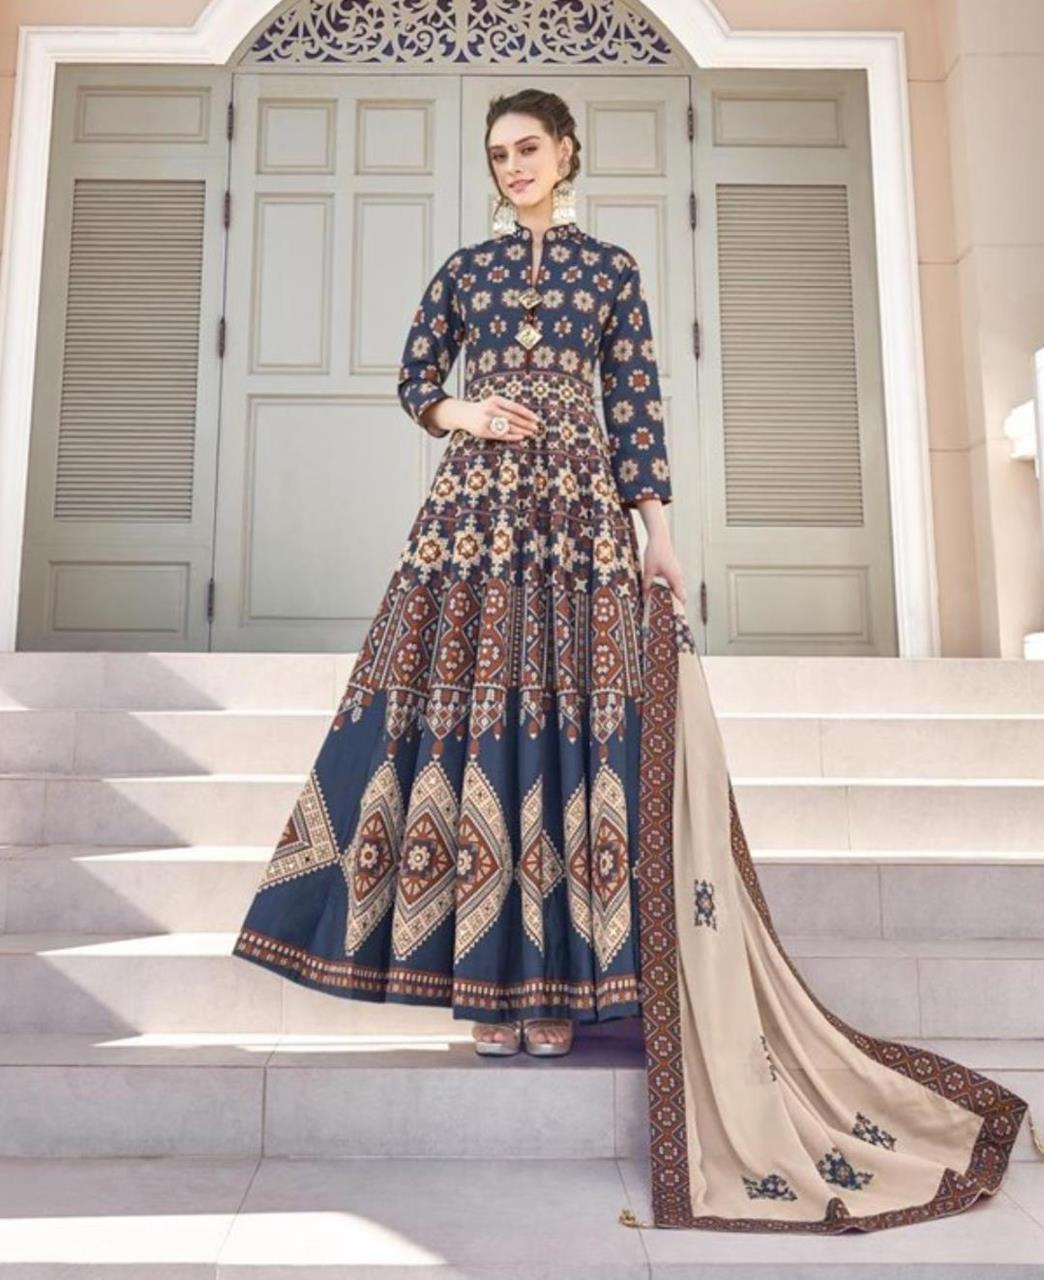 Printed Cotton Straight cut Salwar Kameez in Navy Blue